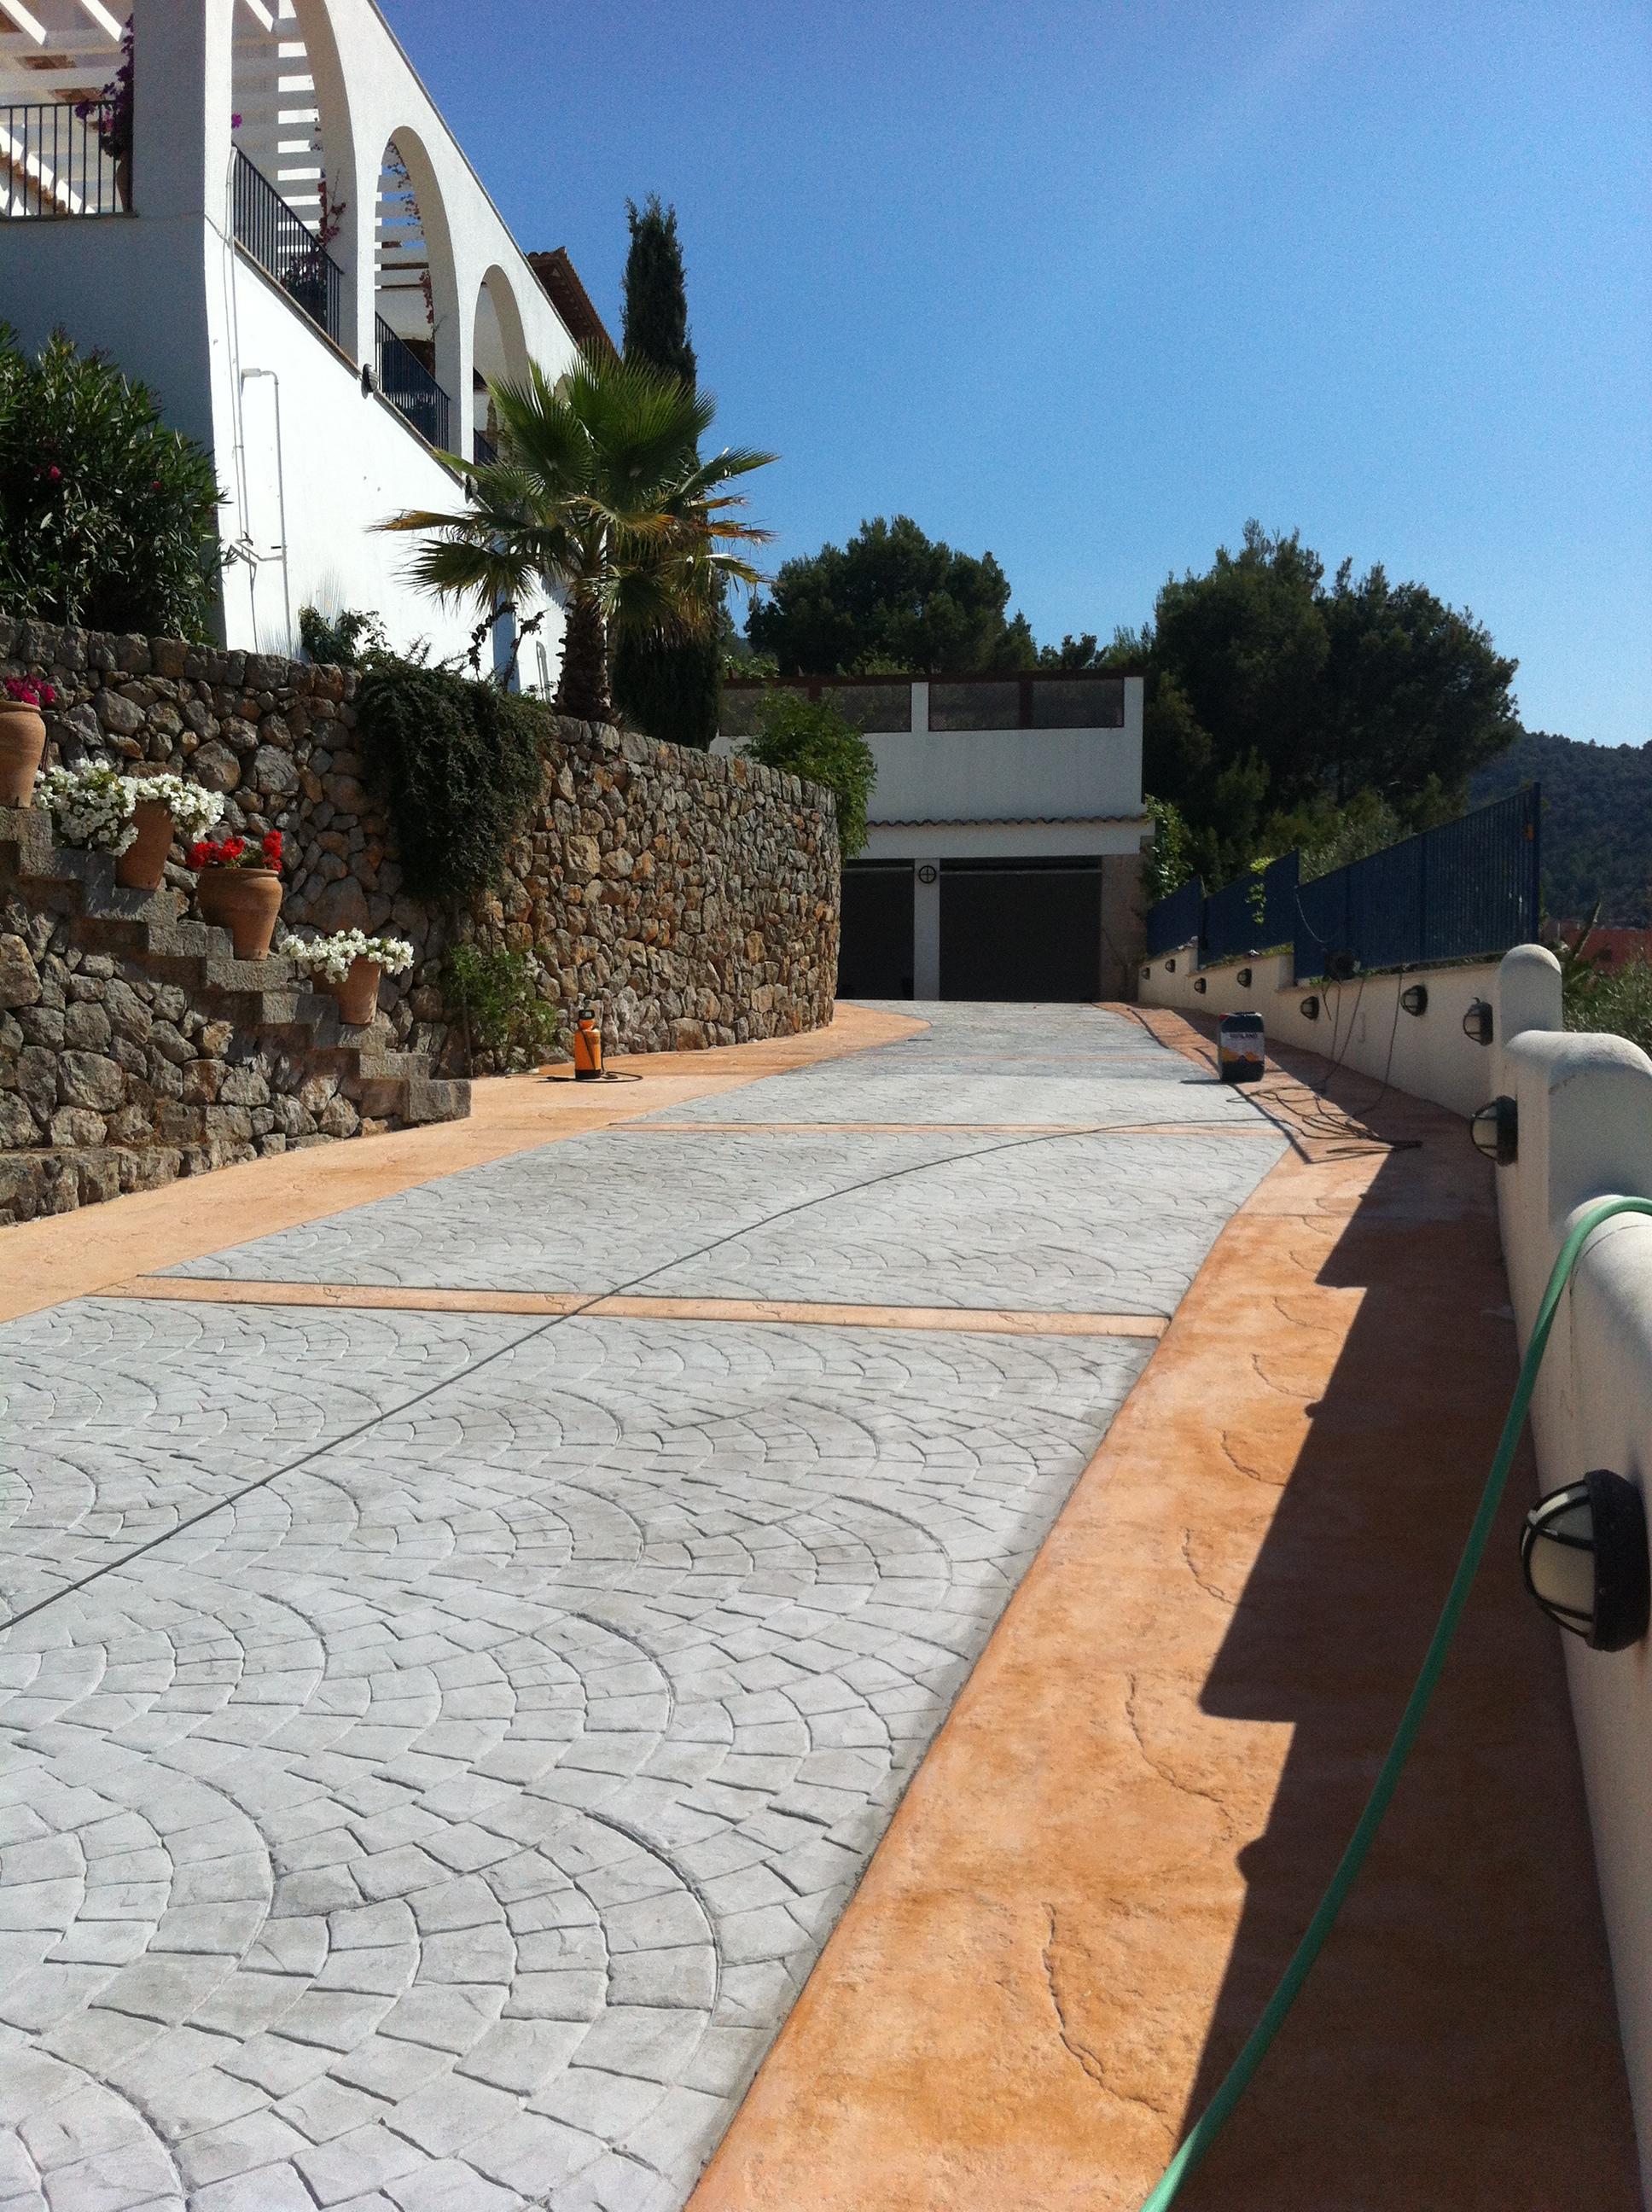 Hormigon Estampado Mallorca. Com Hormigon Impreso Servicios Hormigon ...